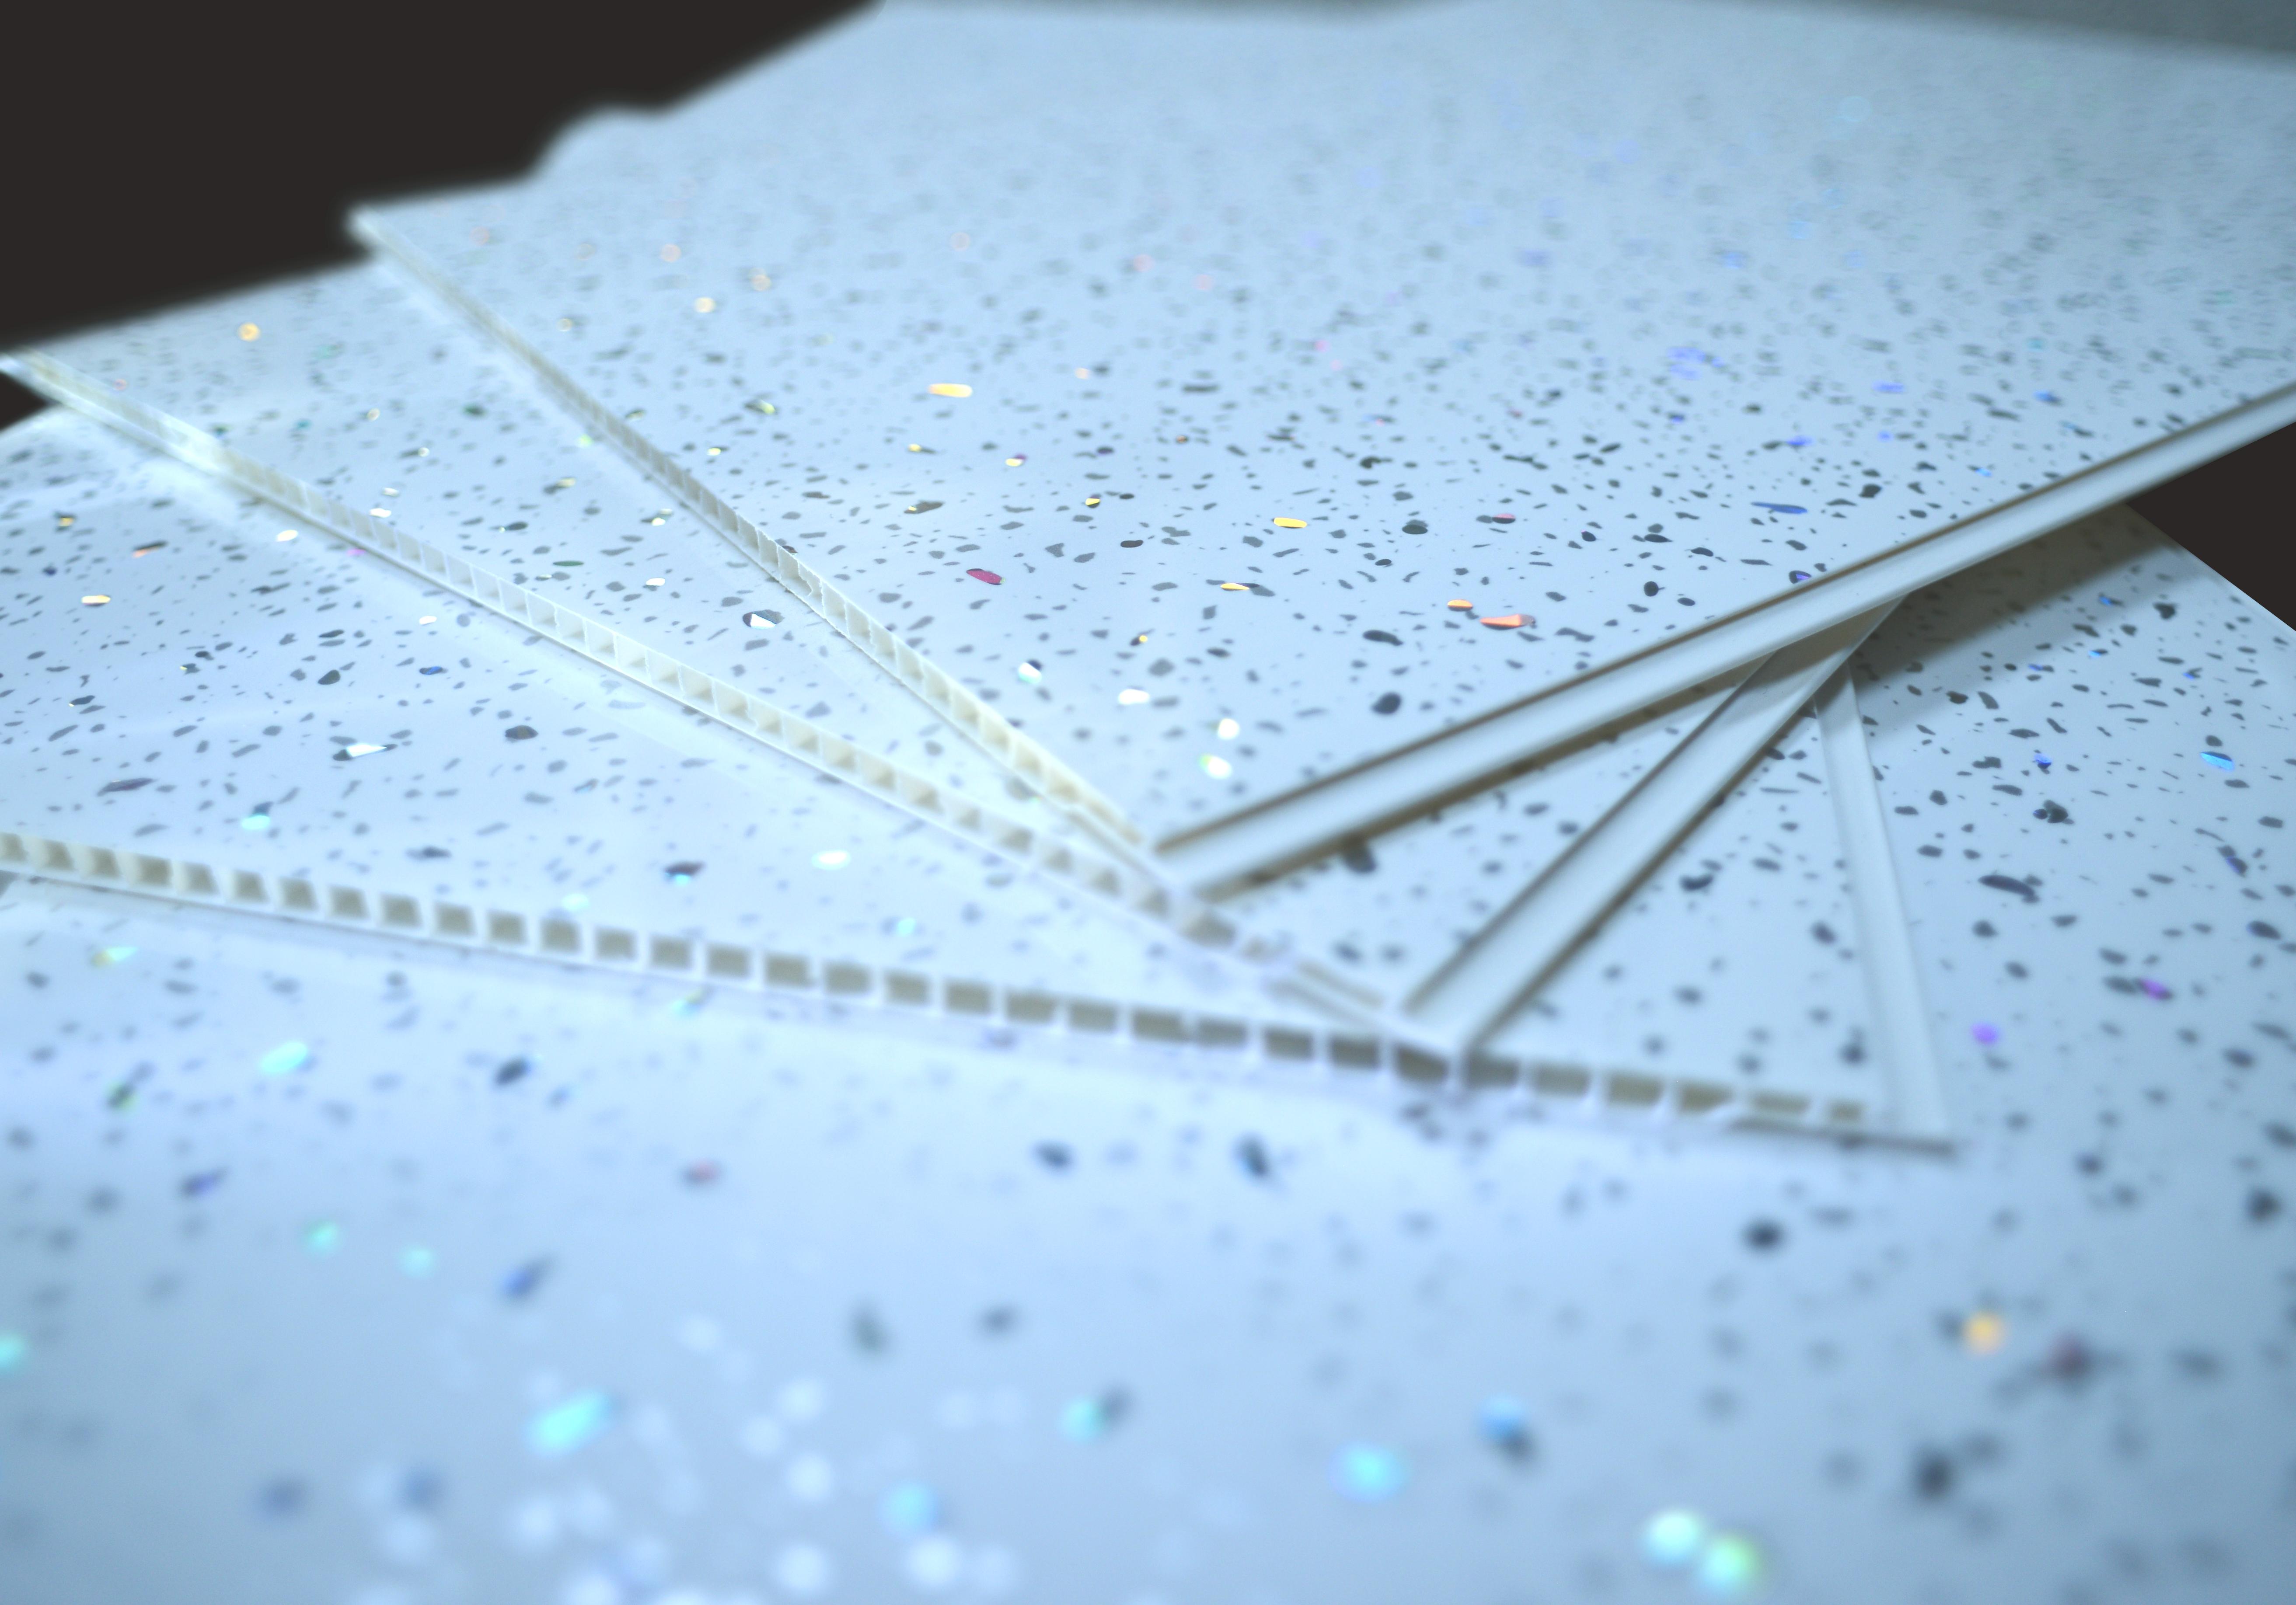 Details about Platinum White Sparkle PVC Bathroom Cladding Ceiling Panels Shower Wet Wall